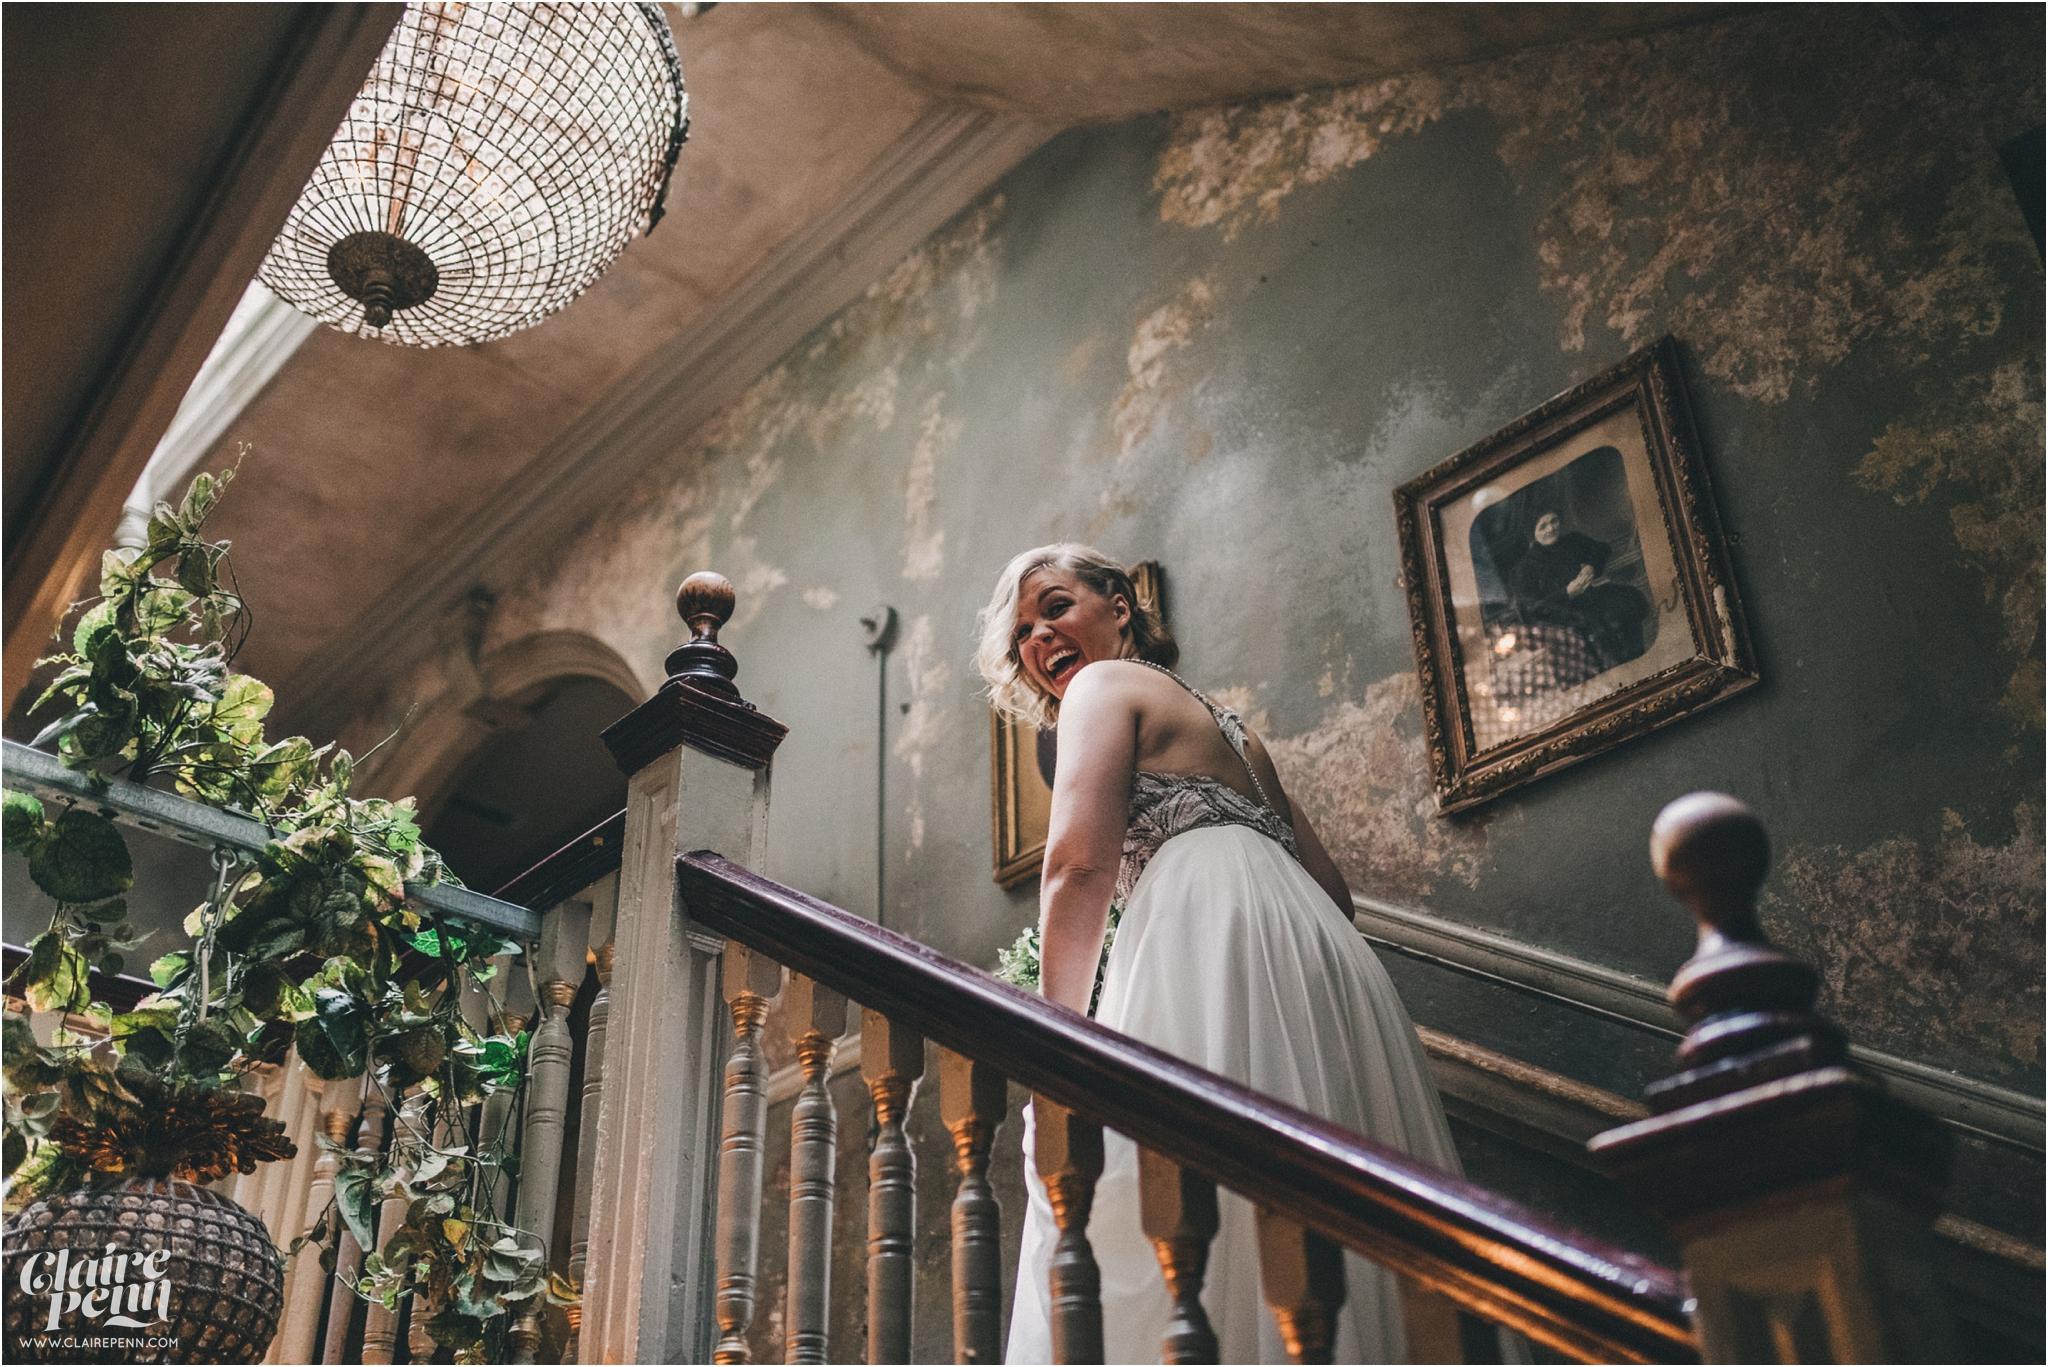 Paradise by way of Kensall Green London pub intimate wedding_0014.jpg